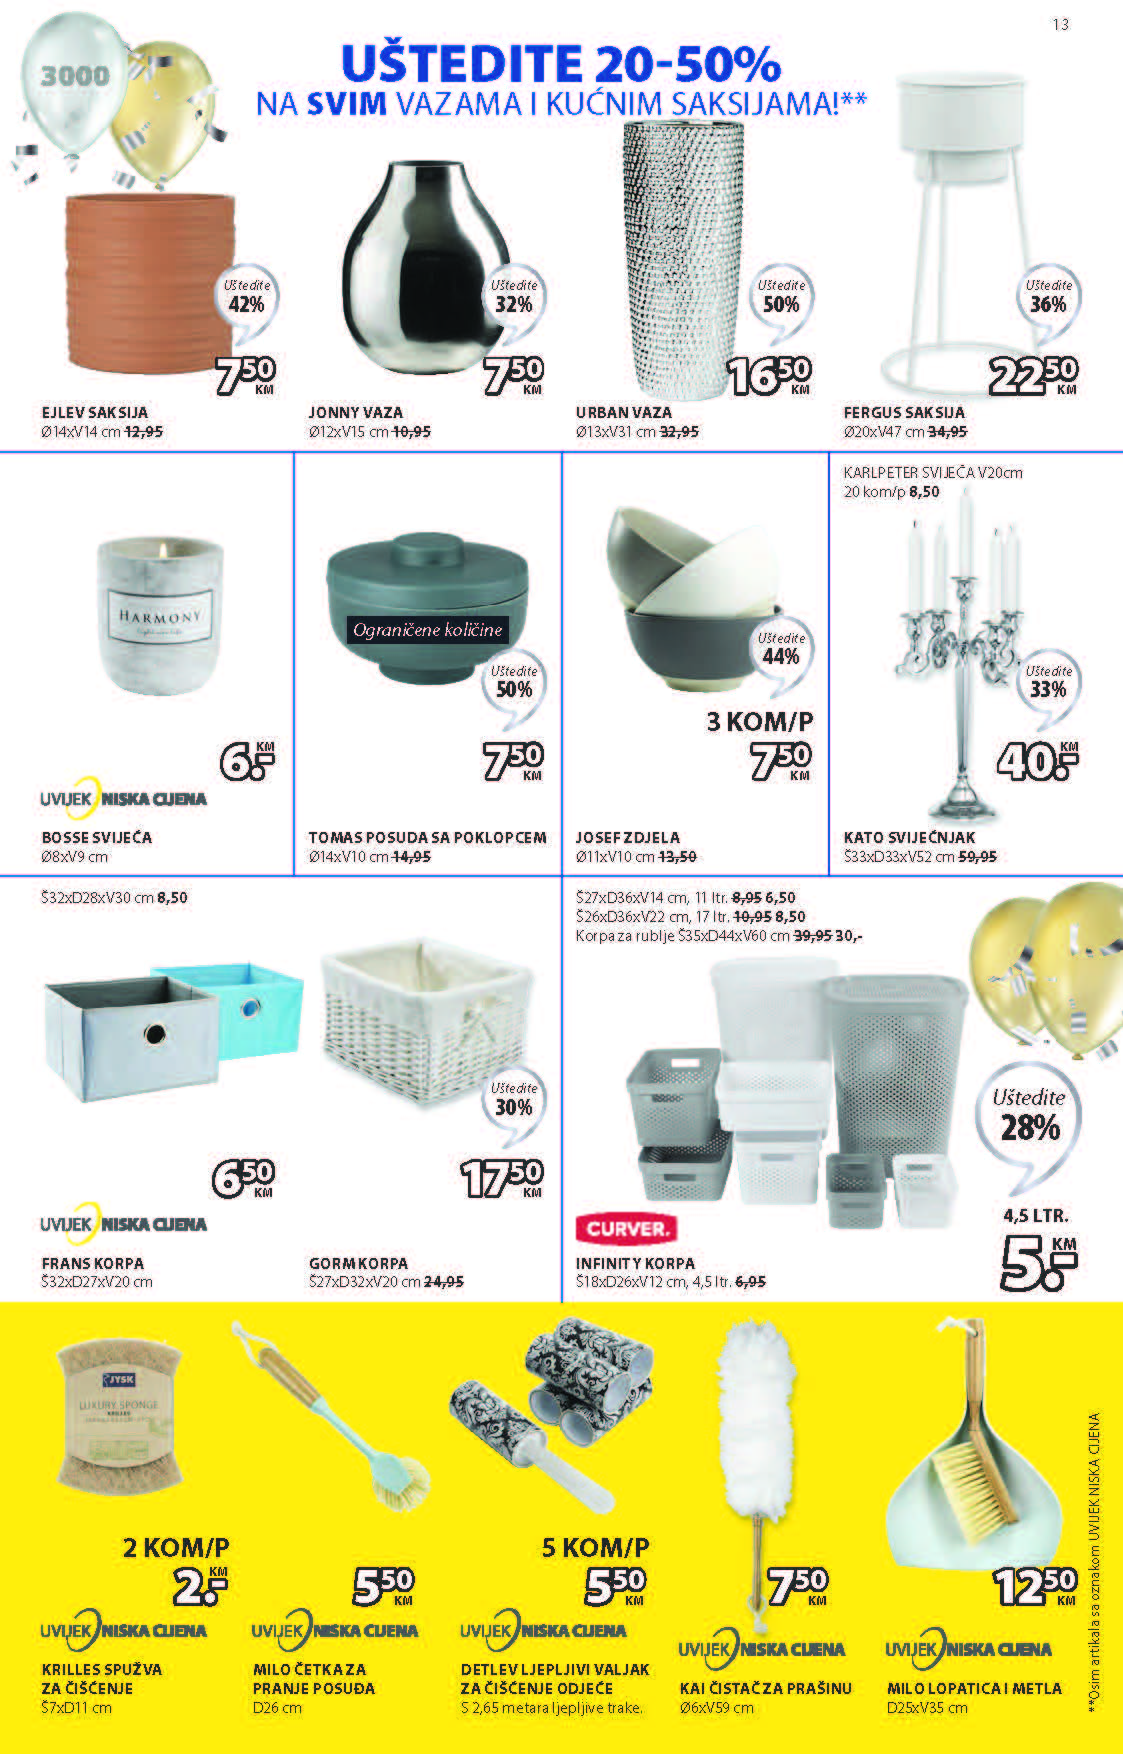 JYSK Katalog Akcijska ponuda MAJ 13.05.2021. 26.05.2021 ekatalozi.com Page 14 1